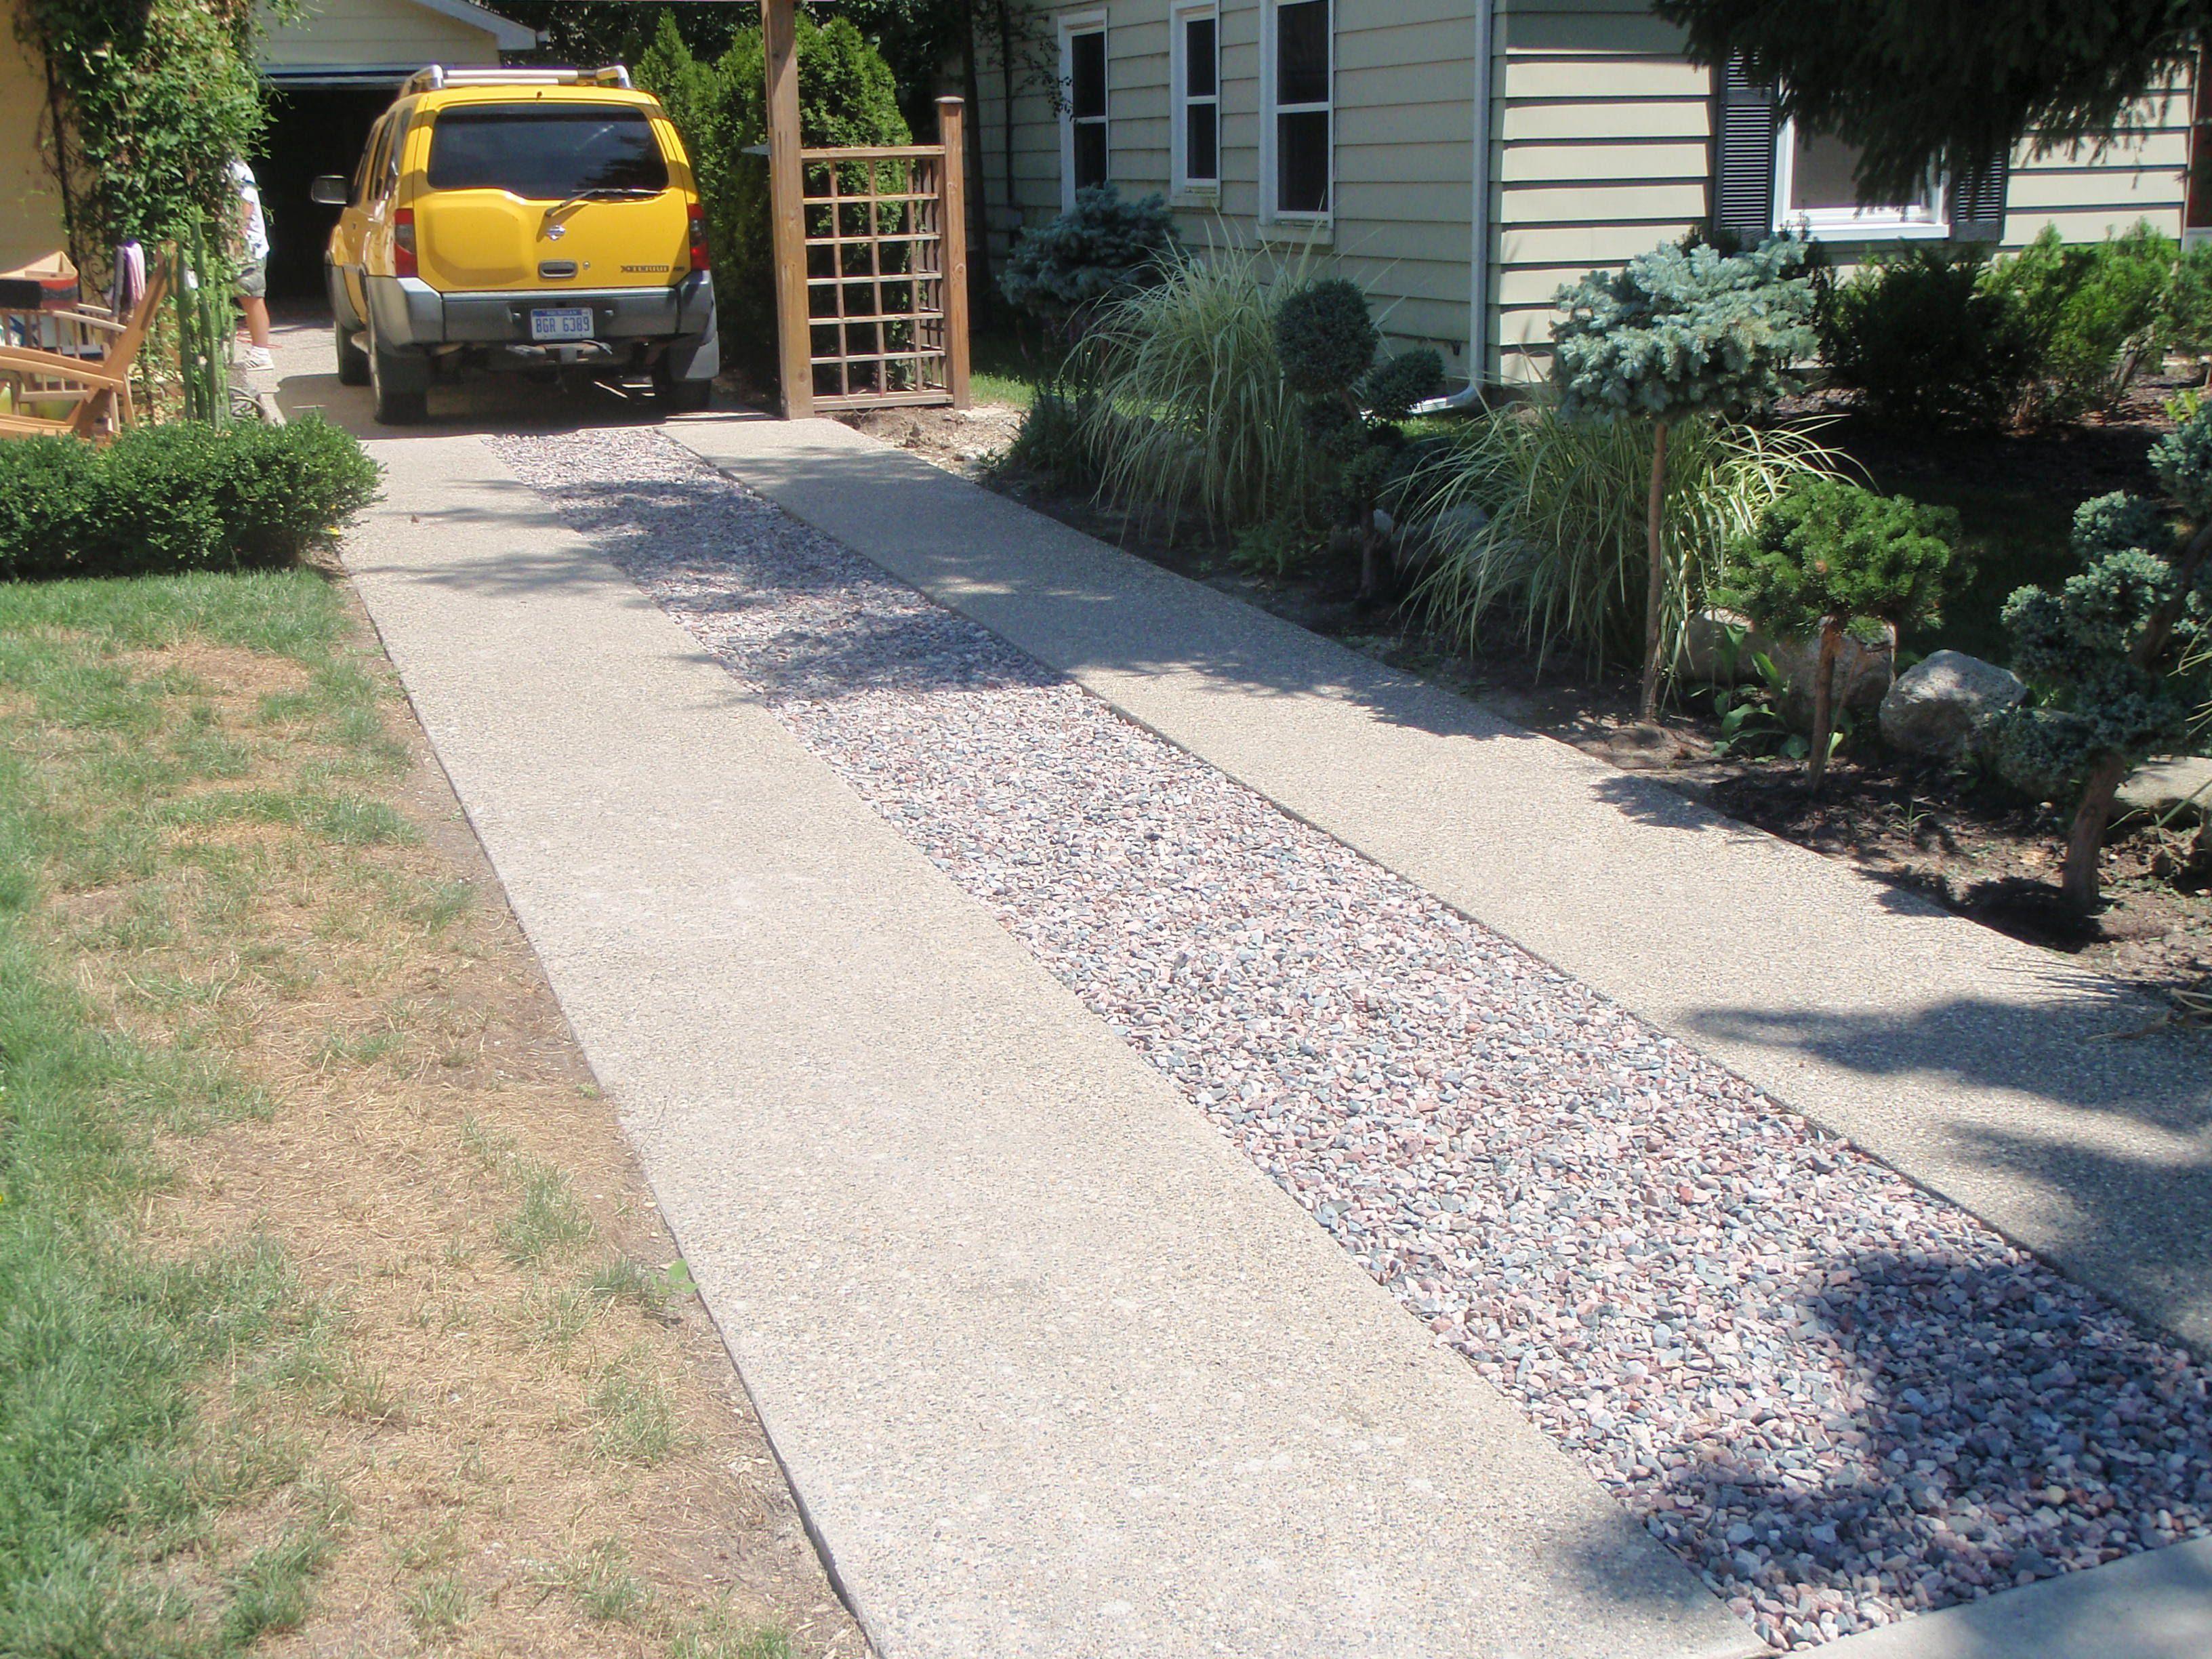 Ribbon driveway driveway pinterest driveways for Driveway addition ideas